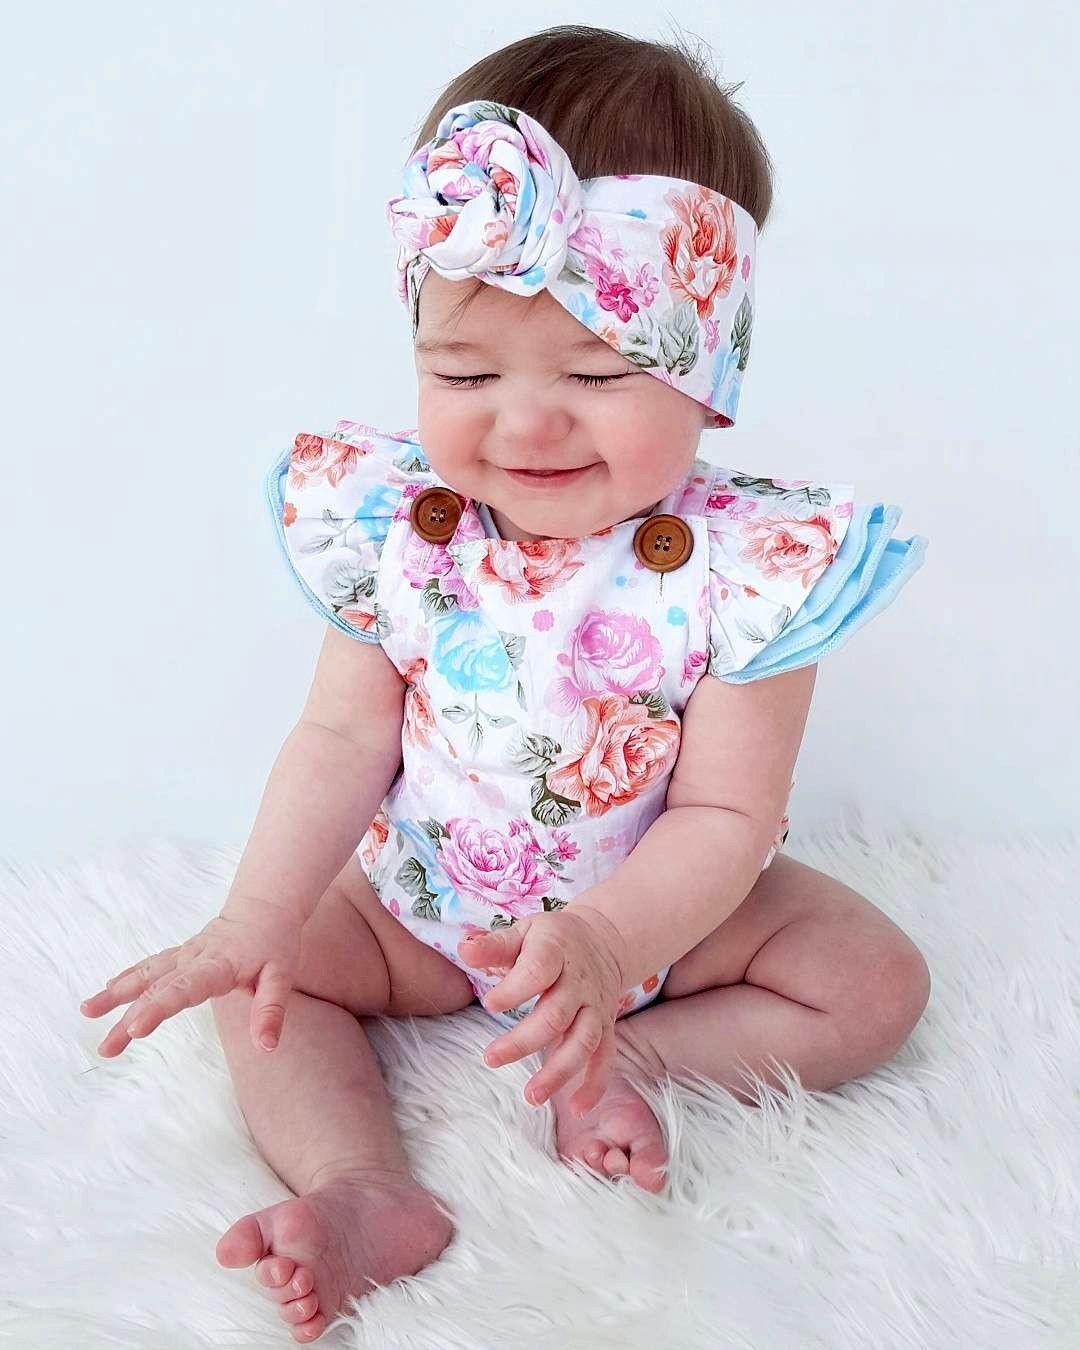 511681c3501e7 2017 Fashion Summer Adorable Baby Girls Floral Print Romper Jumper Clothes  Sunsuit Set